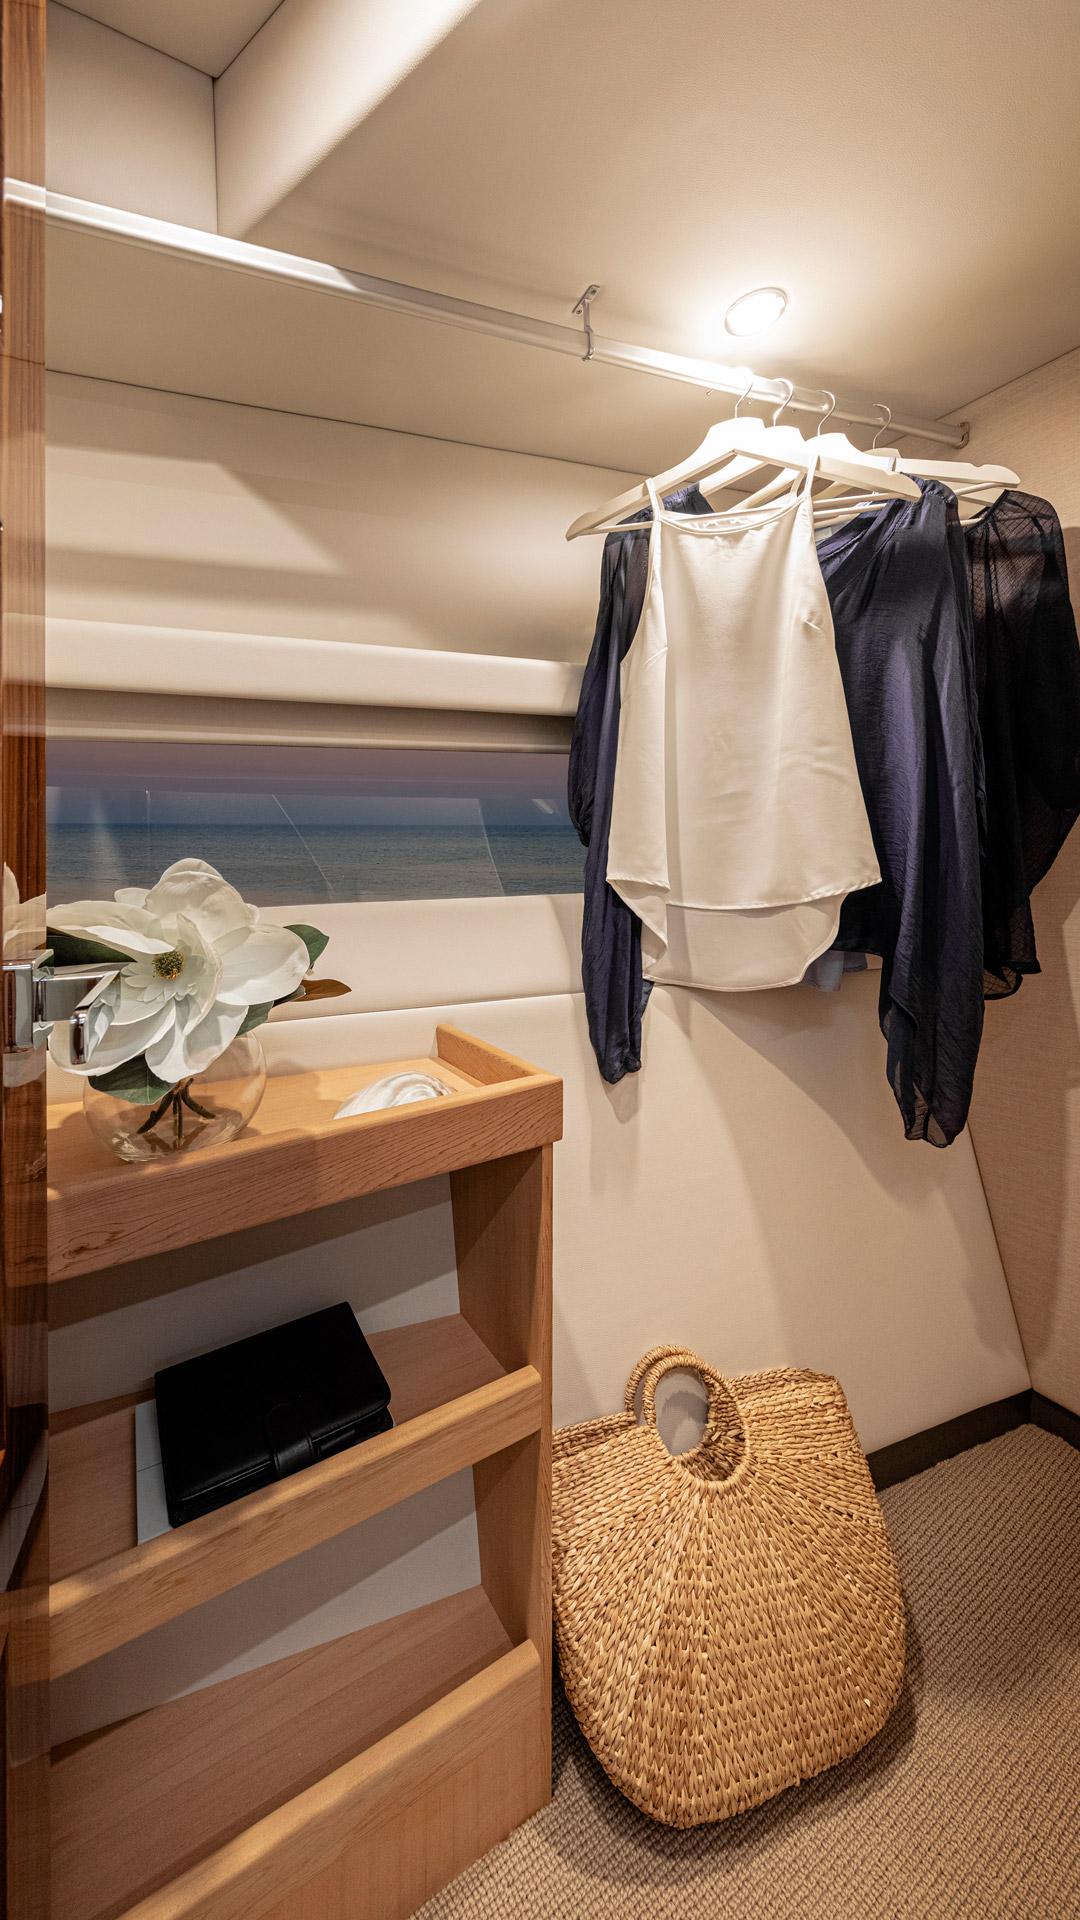 Riviera 50 Sports Motor Yacht Master Stateroom WIR 01 – Gloss Walnut Timber Finish